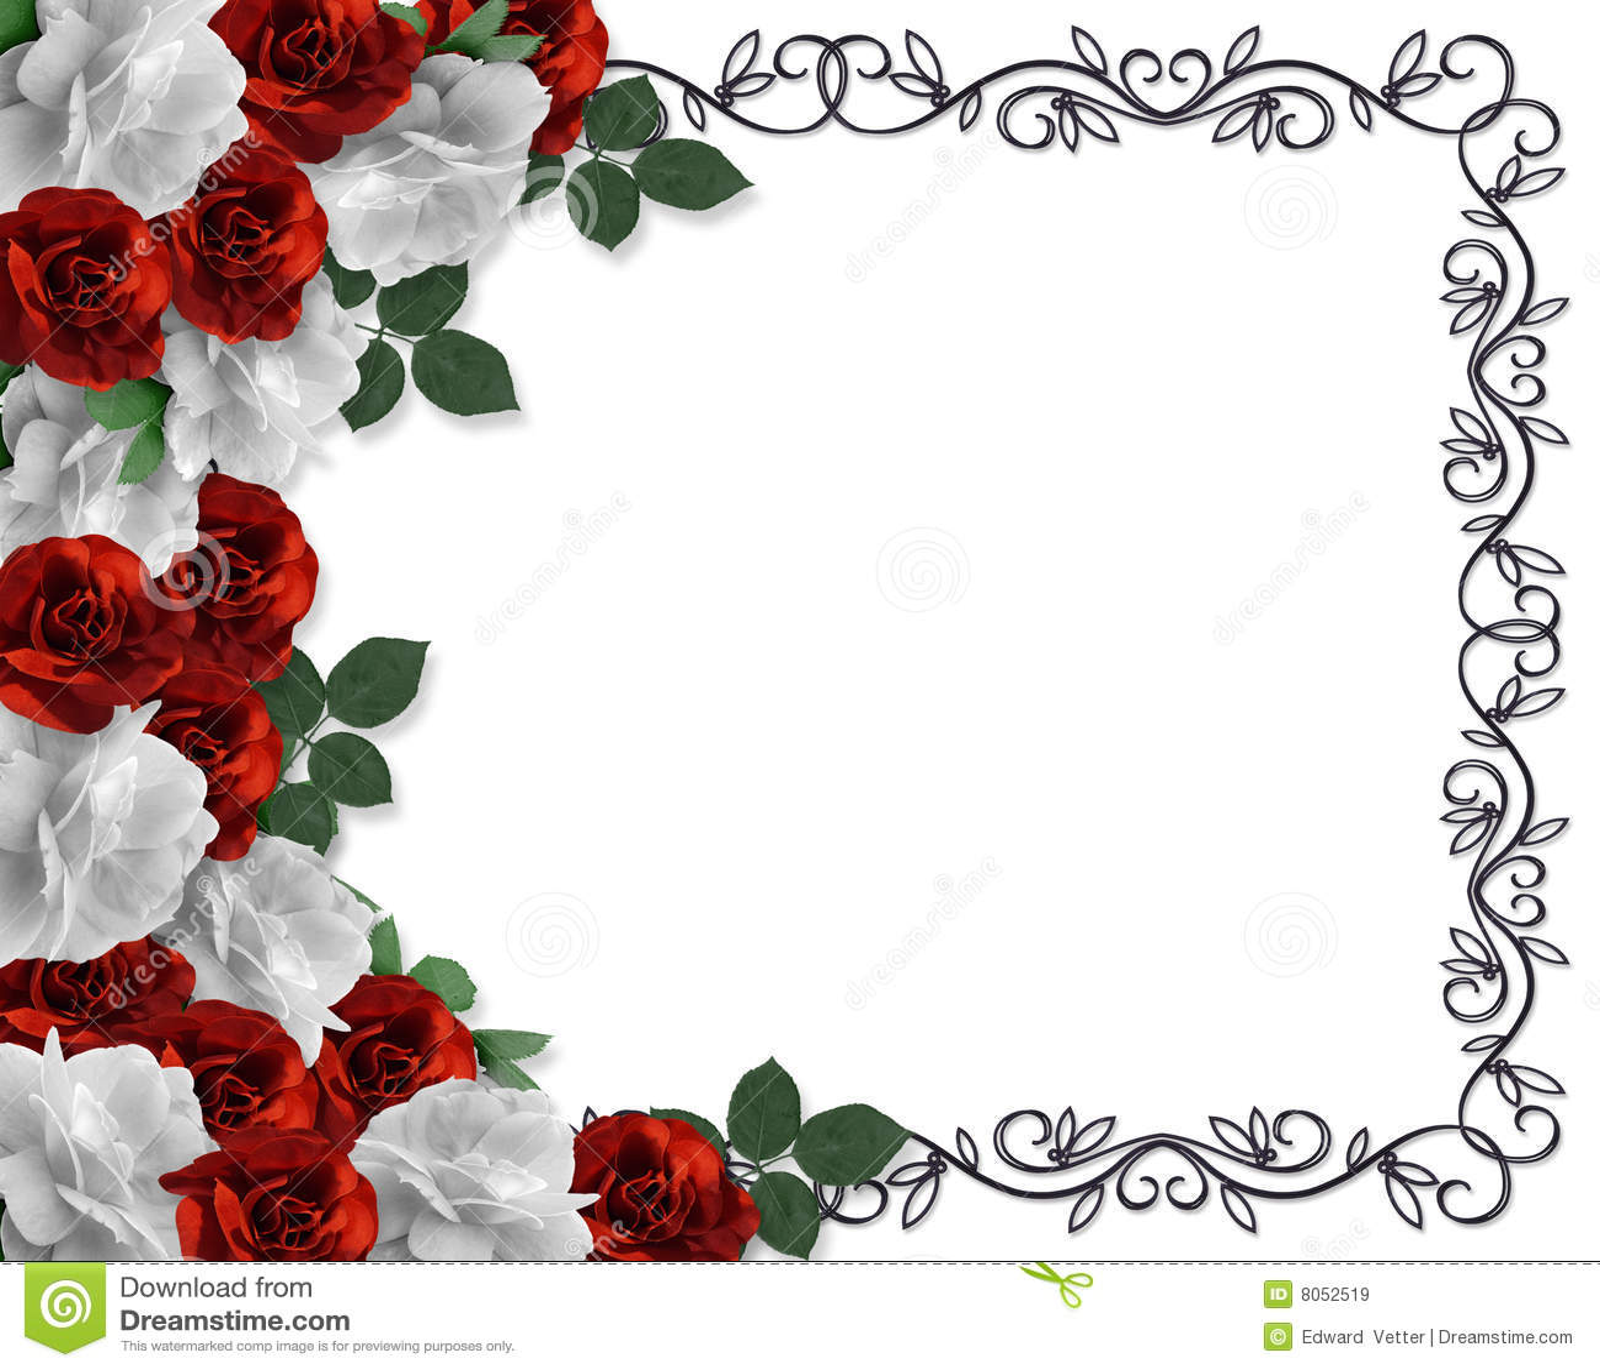 Wedding Borders: Wedding Border Red Roses Ornamental Stock Illustration